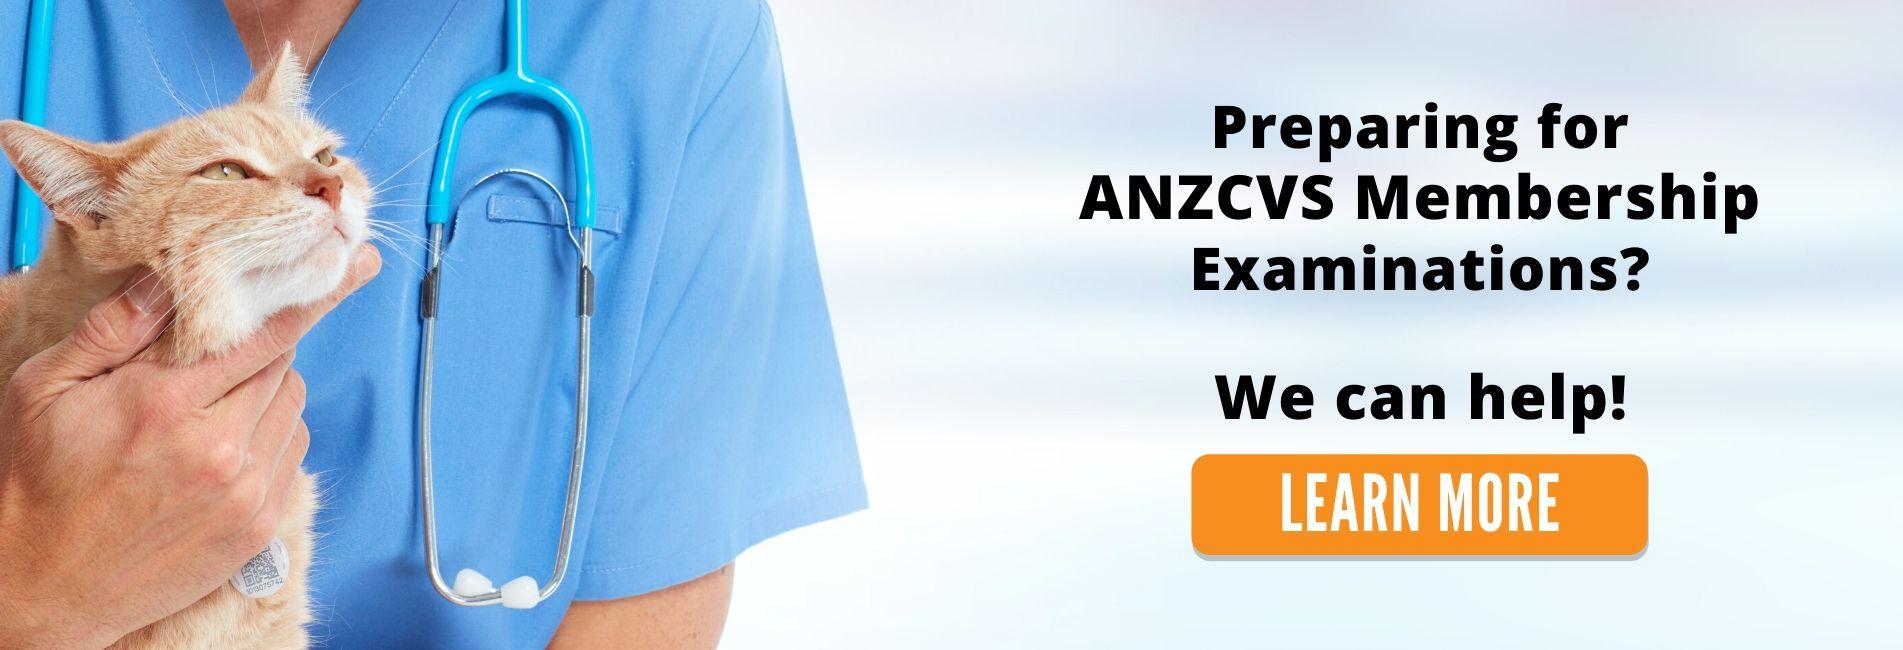 ANZCVS Membership Examination - Vet Education